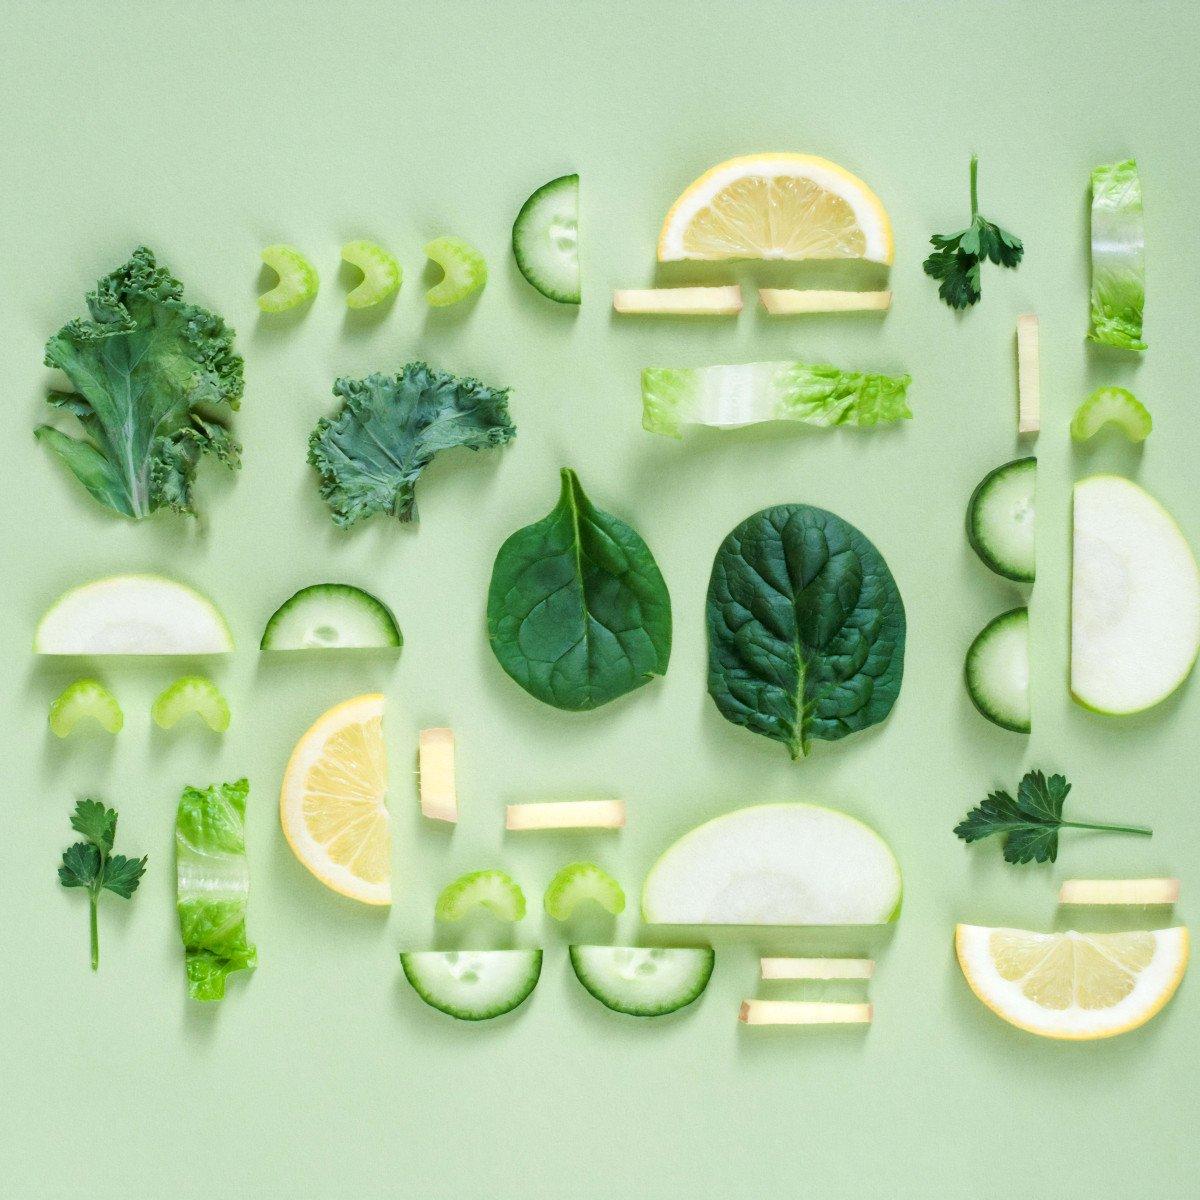 Let's talk about: Ernährungsmythen